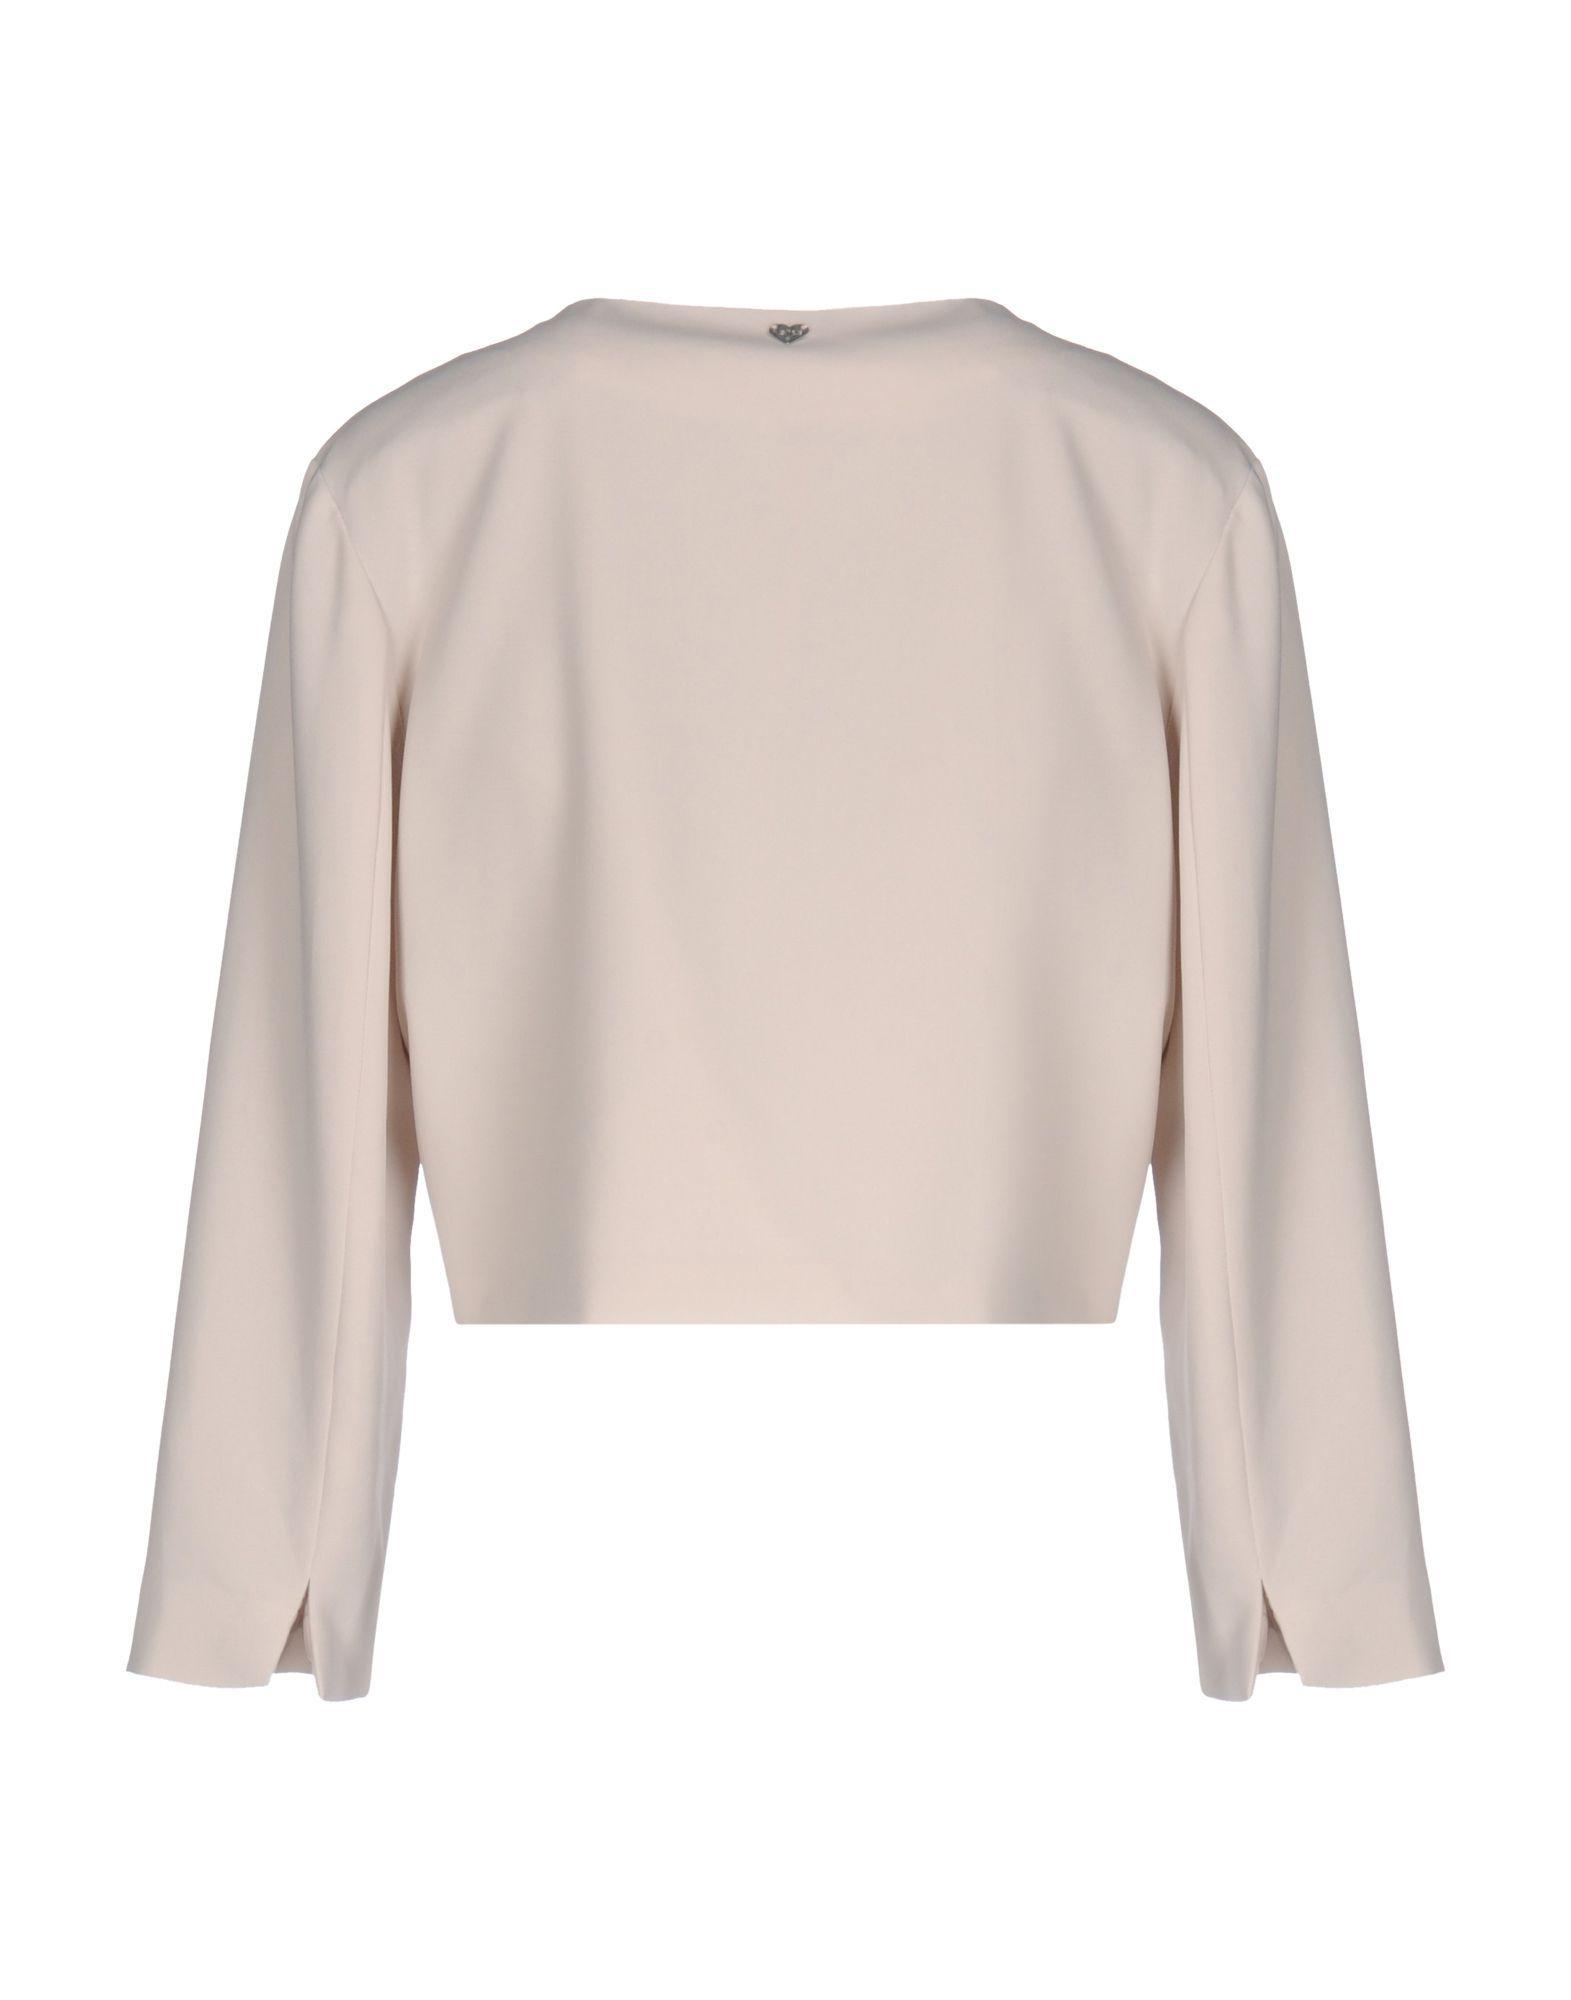 Blugirl Blumarine Beige Crepe Jacket